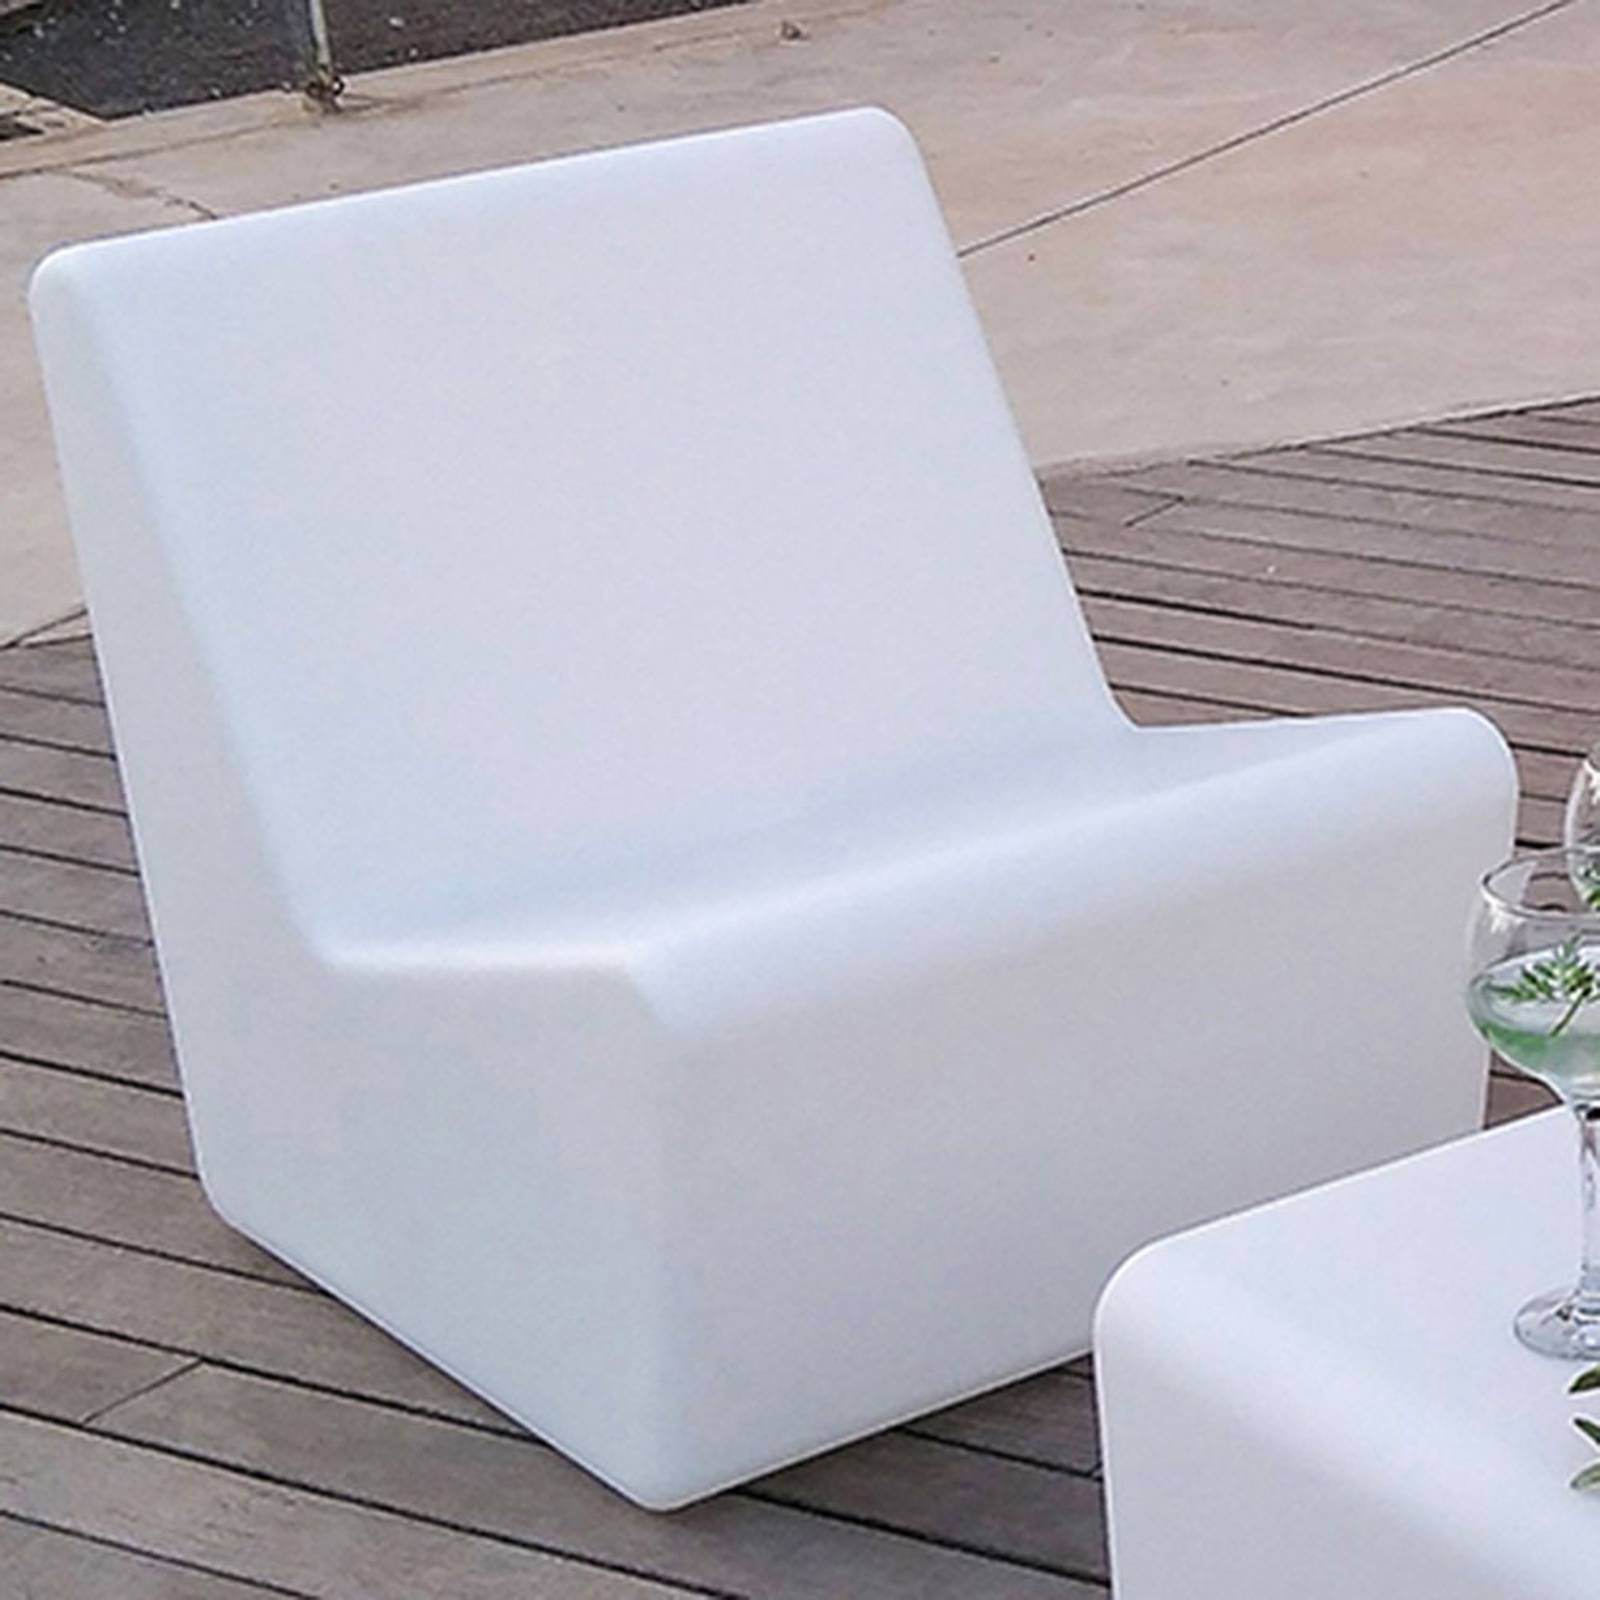 Newgarden Tarida Sit LED fauteuil solar